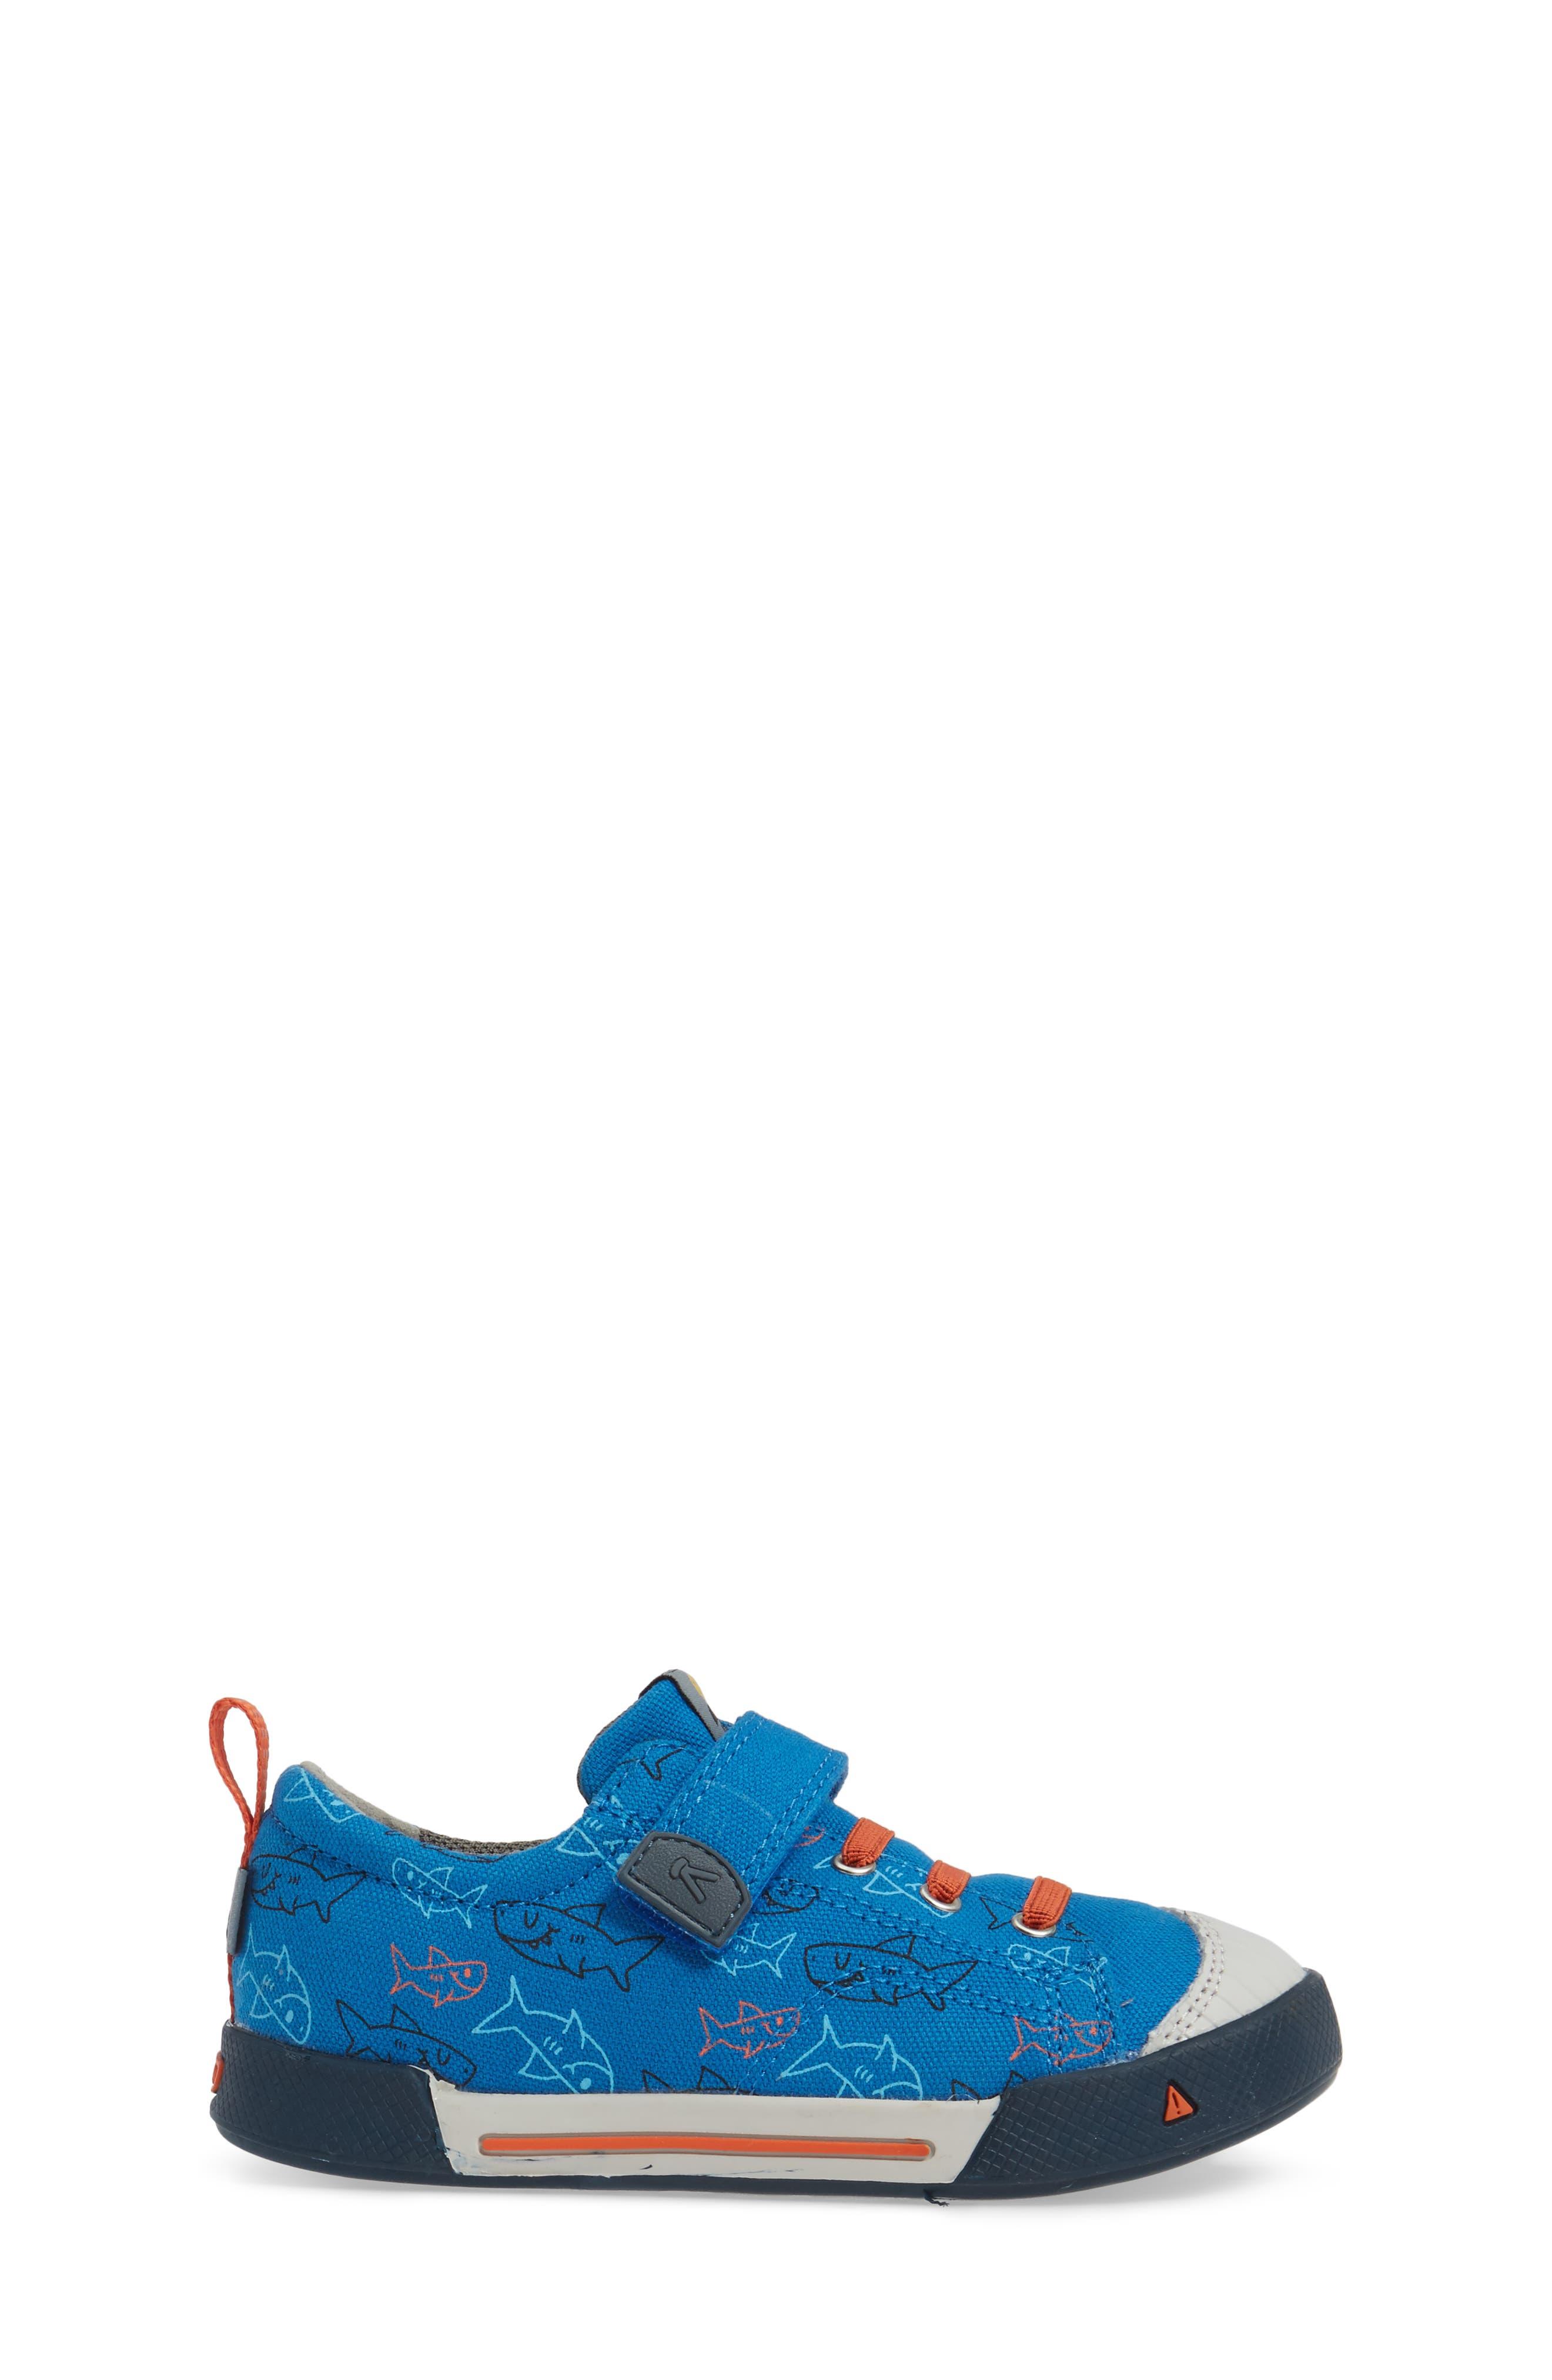 Encanto Finley Sneaker,                             Alternate thumbnail 3, color,                             402